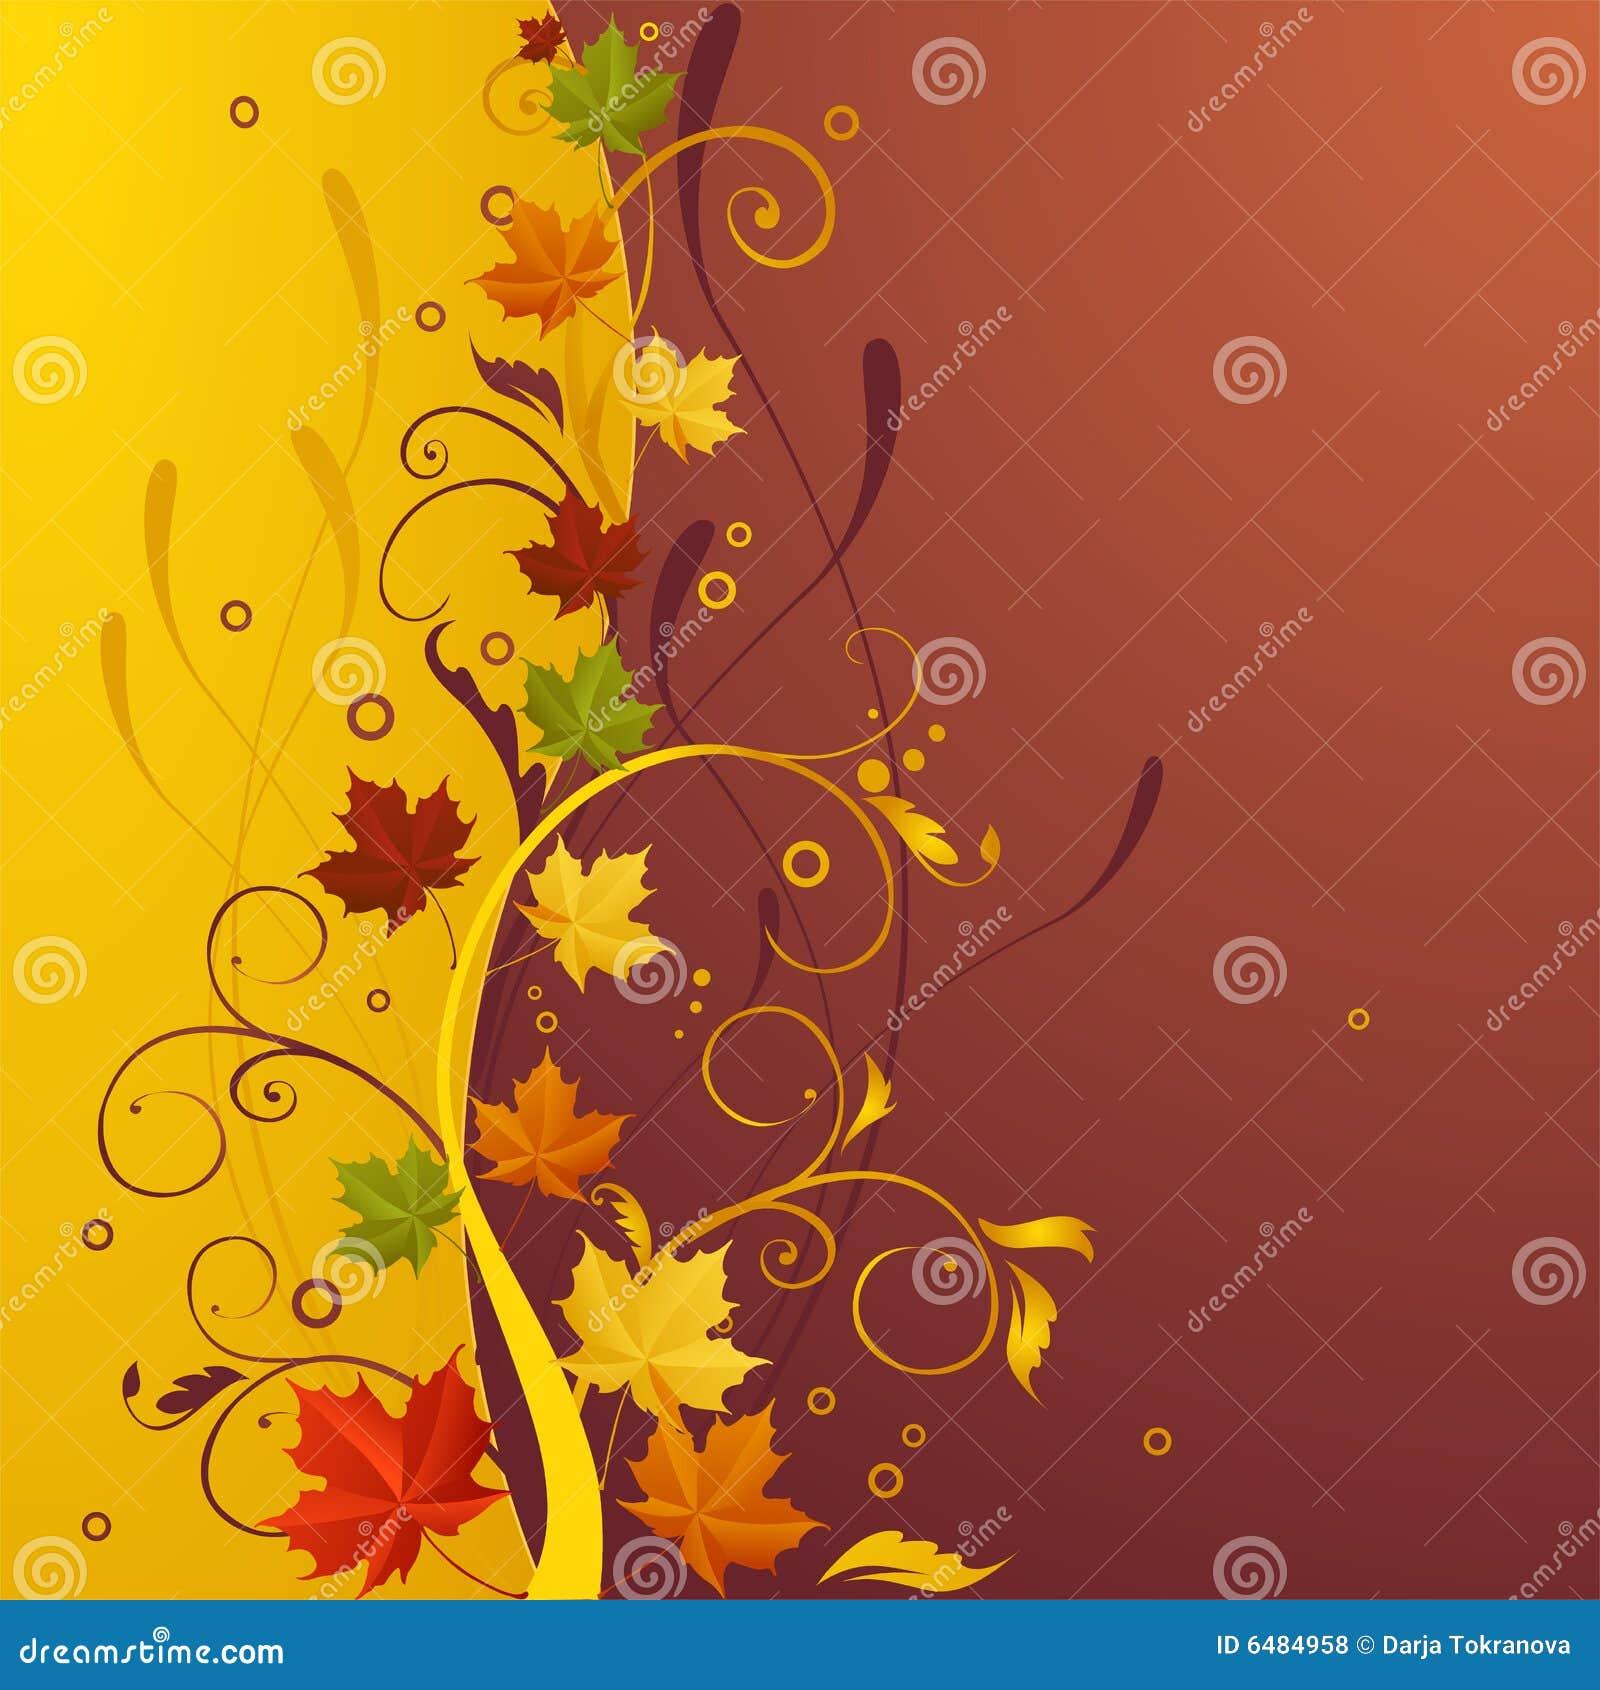 Fall design